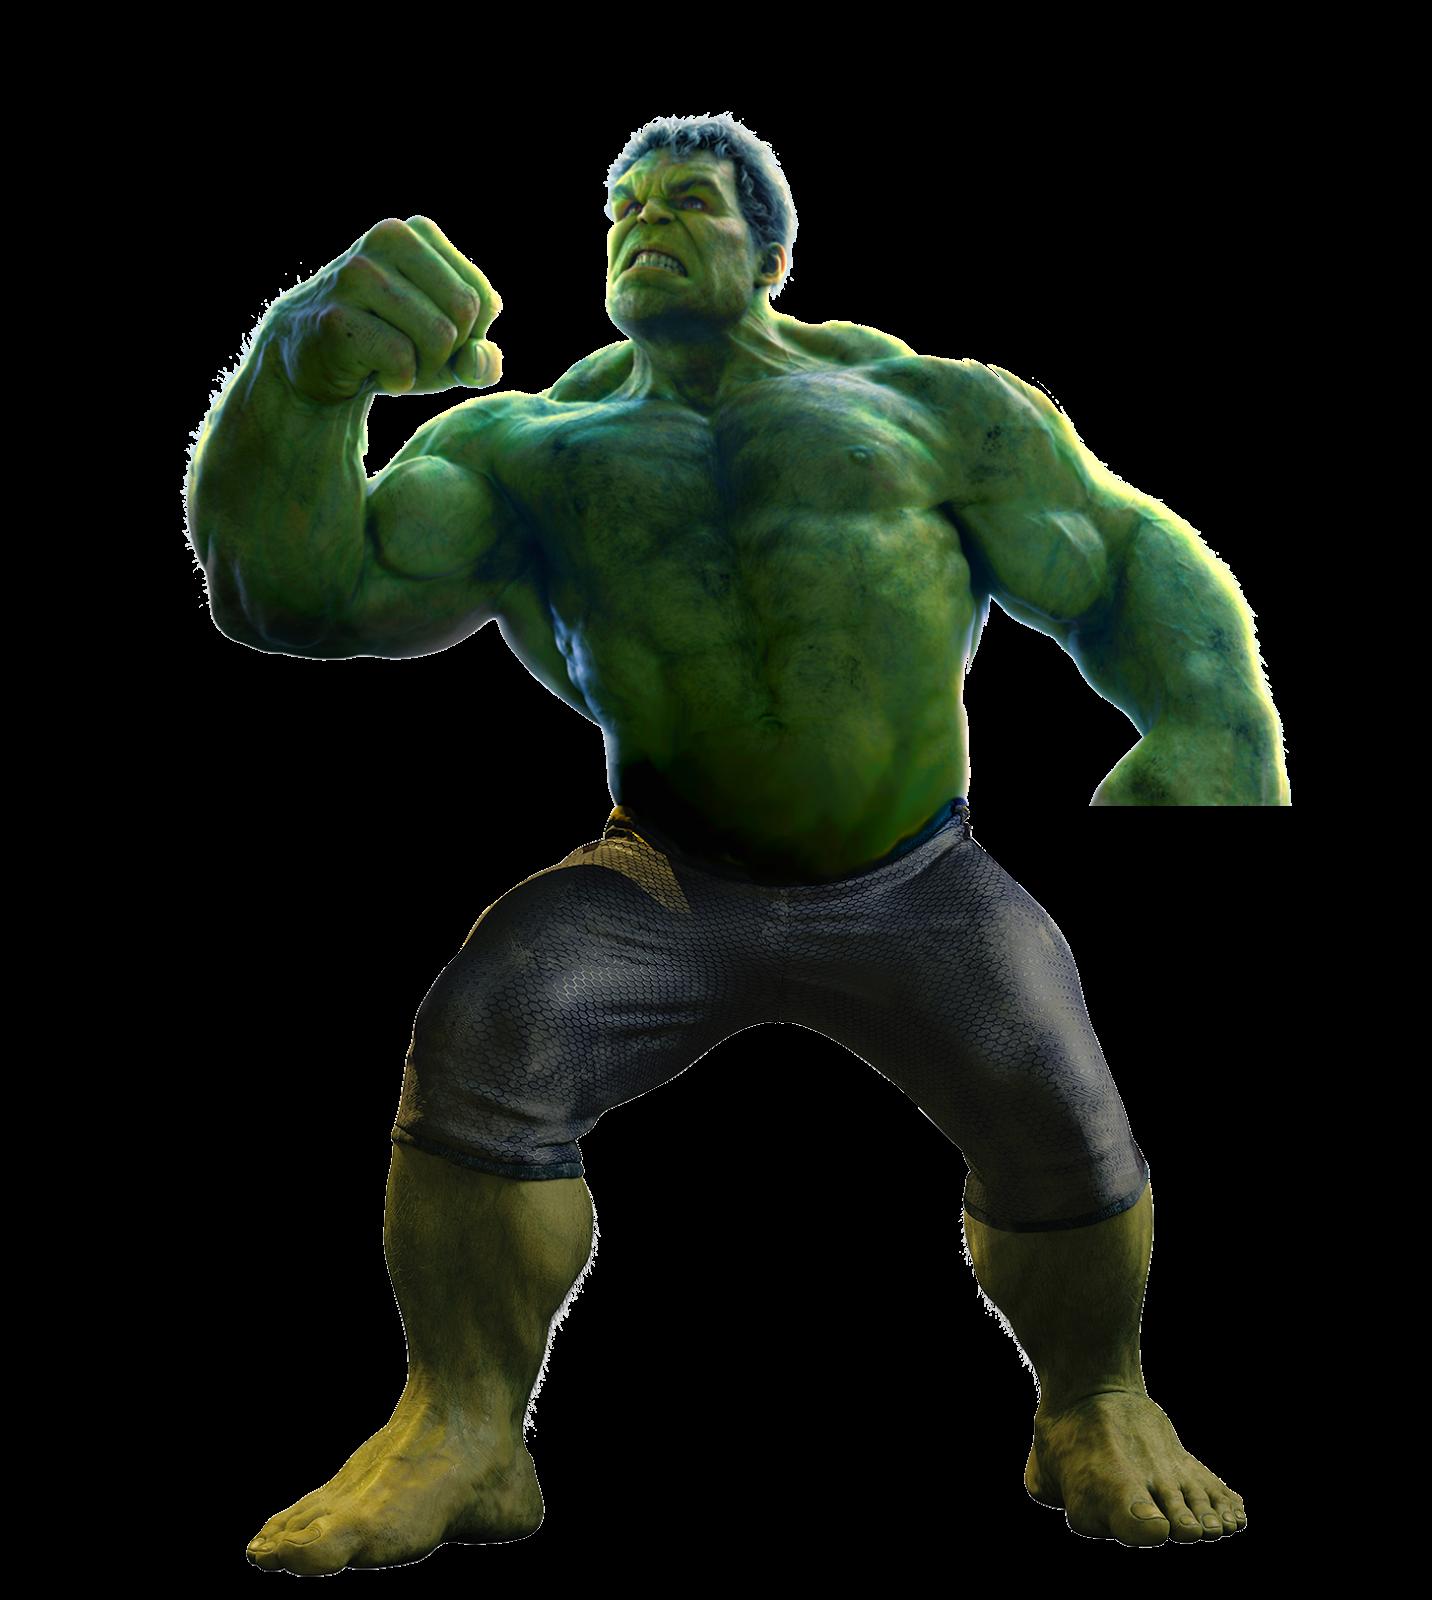 PNG Hulk (Avengers, Vingadores, Thor Ragnarok) - Hulk HD PNG